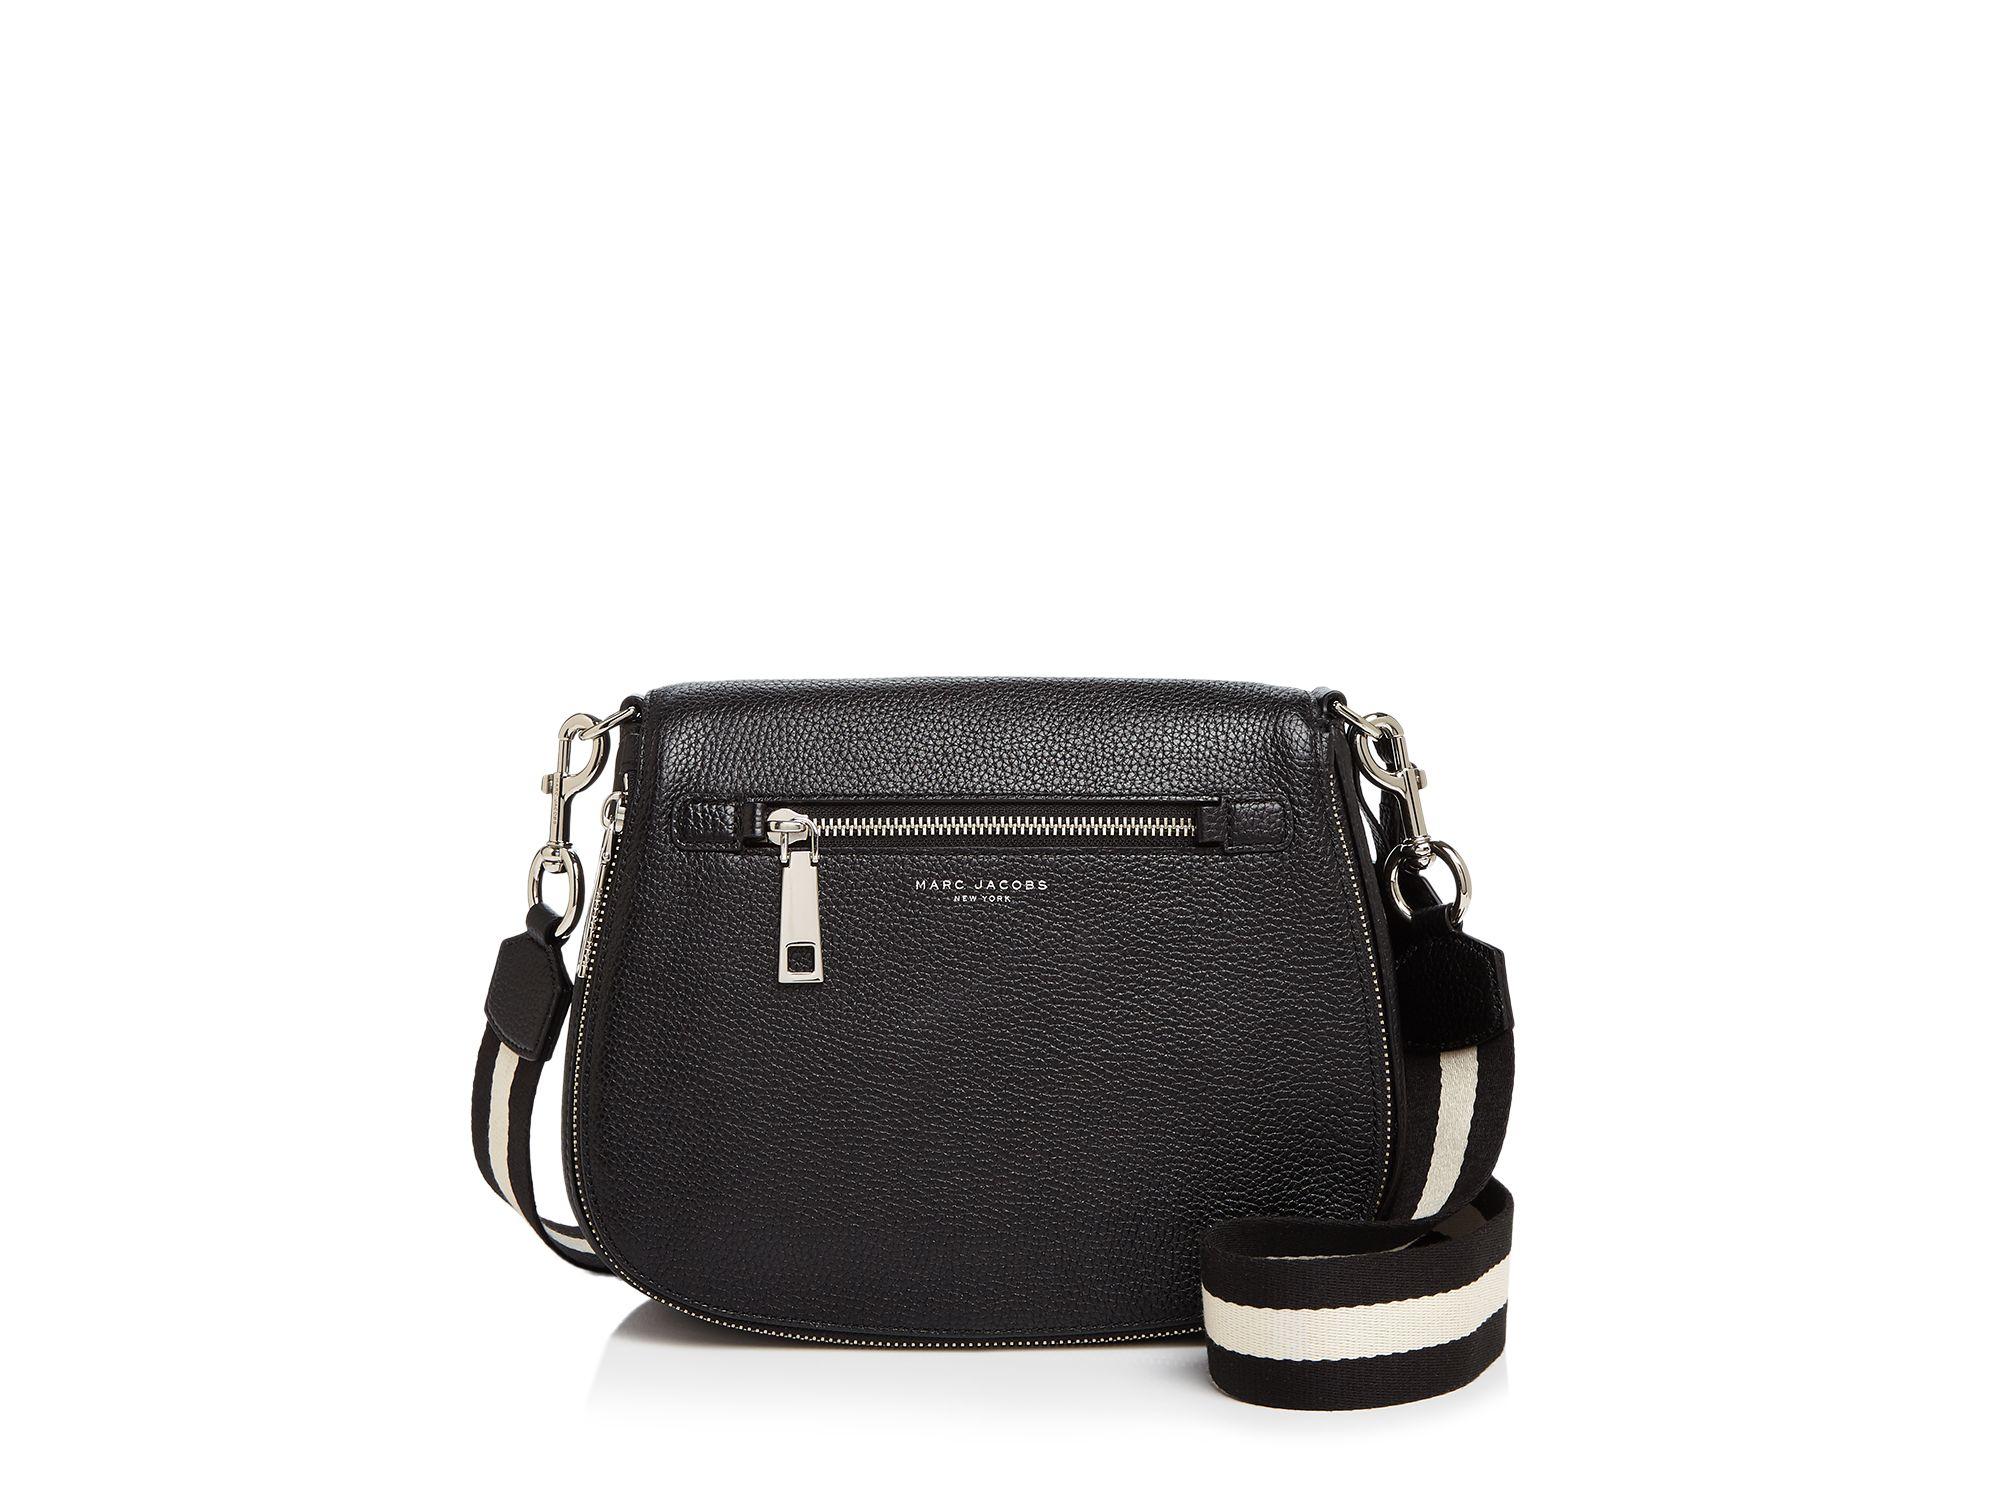 ea9580e6c10c Lyst - Marc Jacobs Gotham City Saddle Bag in Black